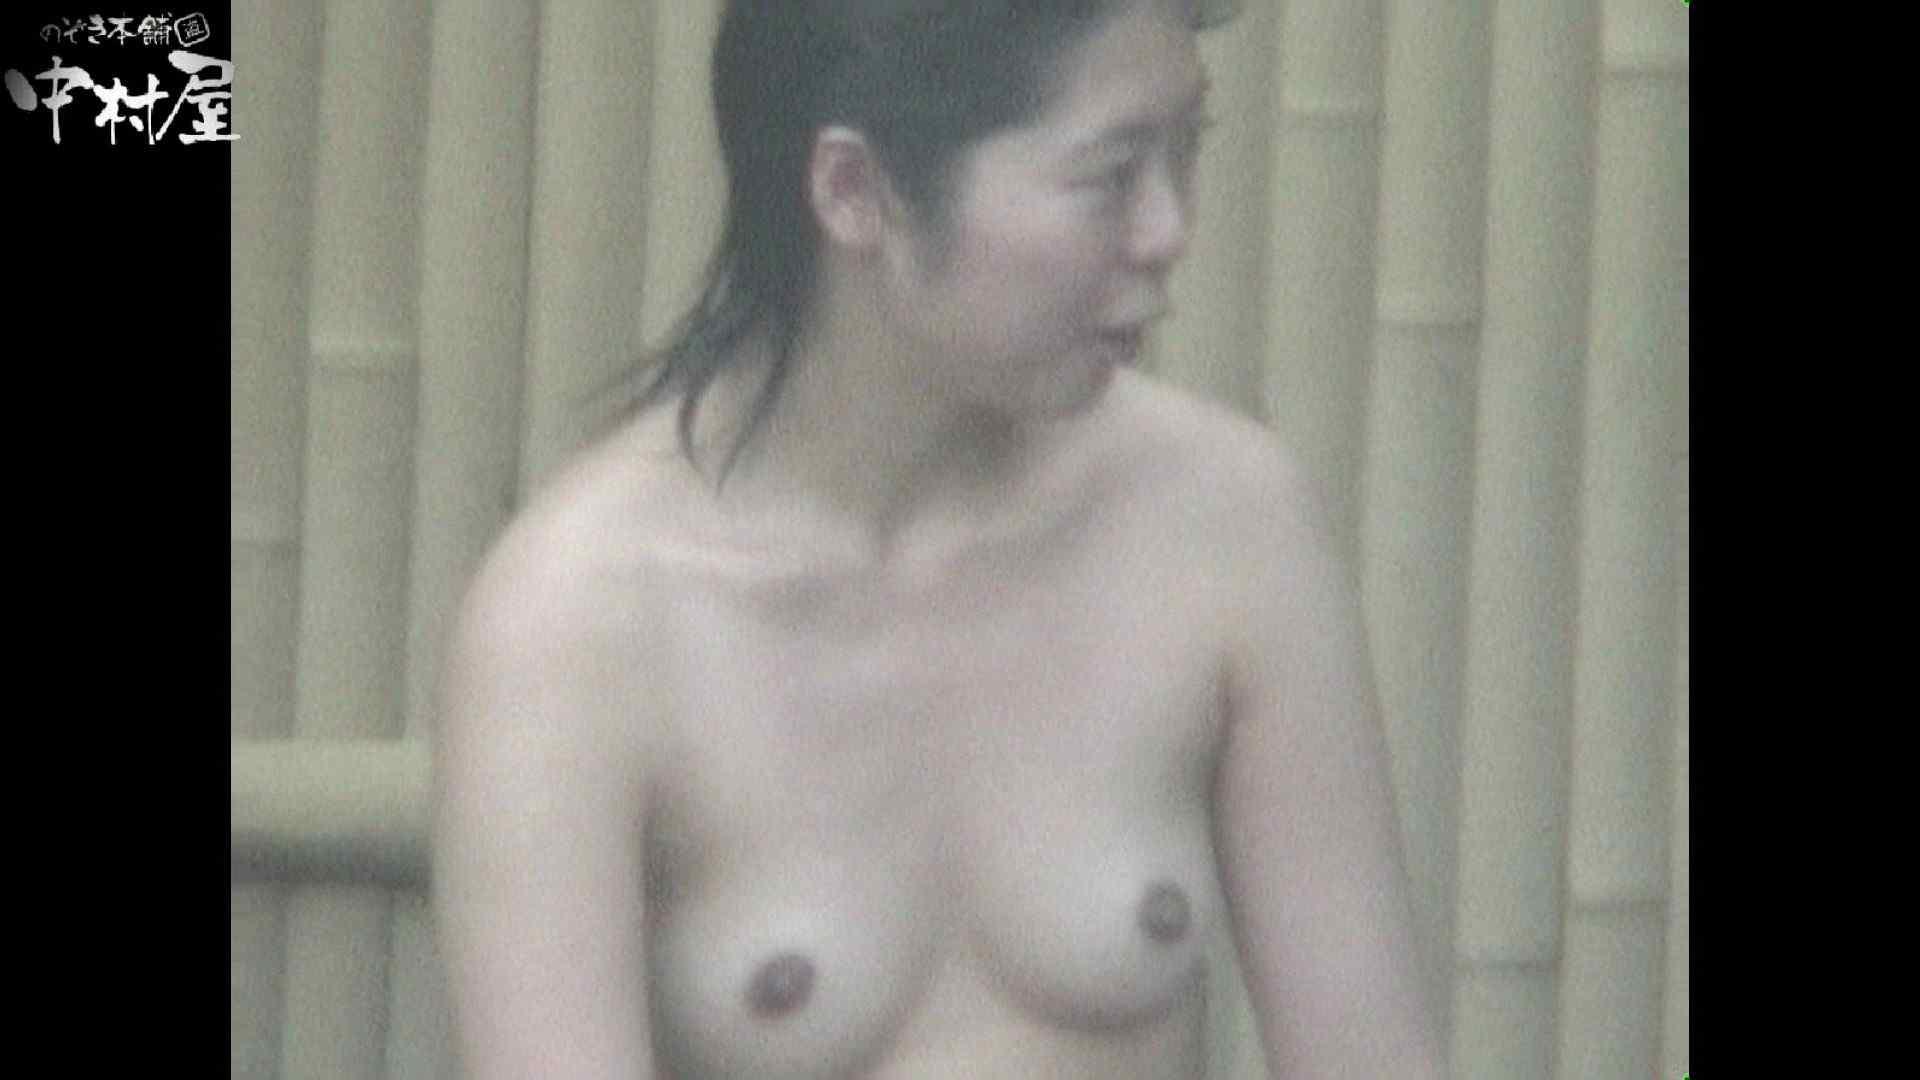 Aquaな露天風呂Vol.932 露天 オメコ動画キャプチャ 104pic 9